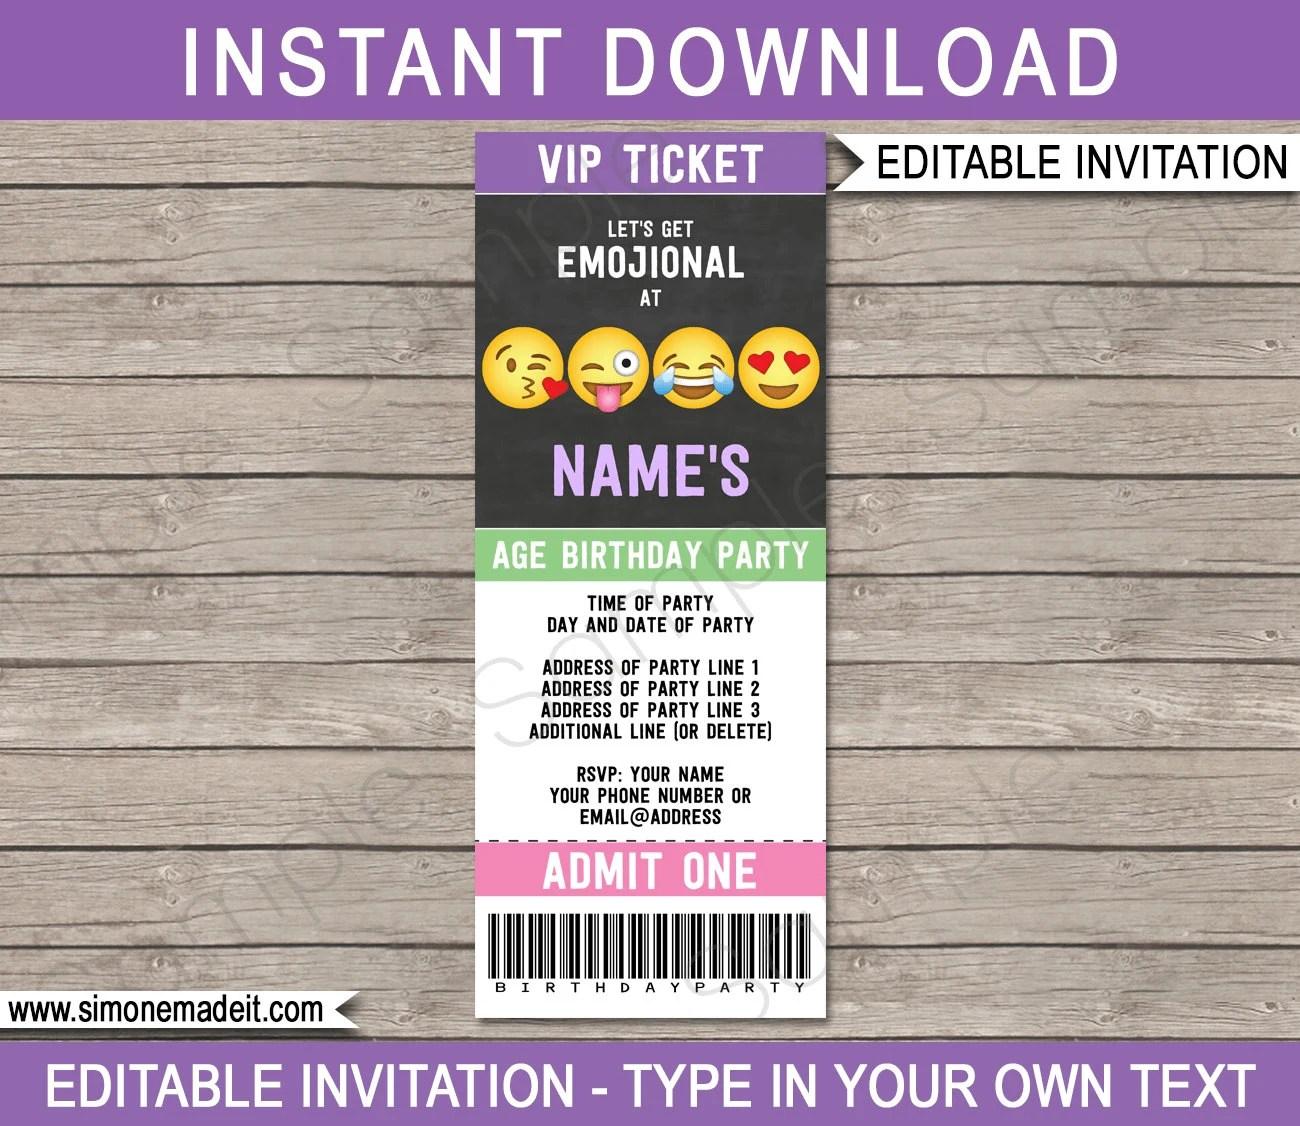 Emoji Ticket Invitation Template Emoji Birthday Party - ticket invitation